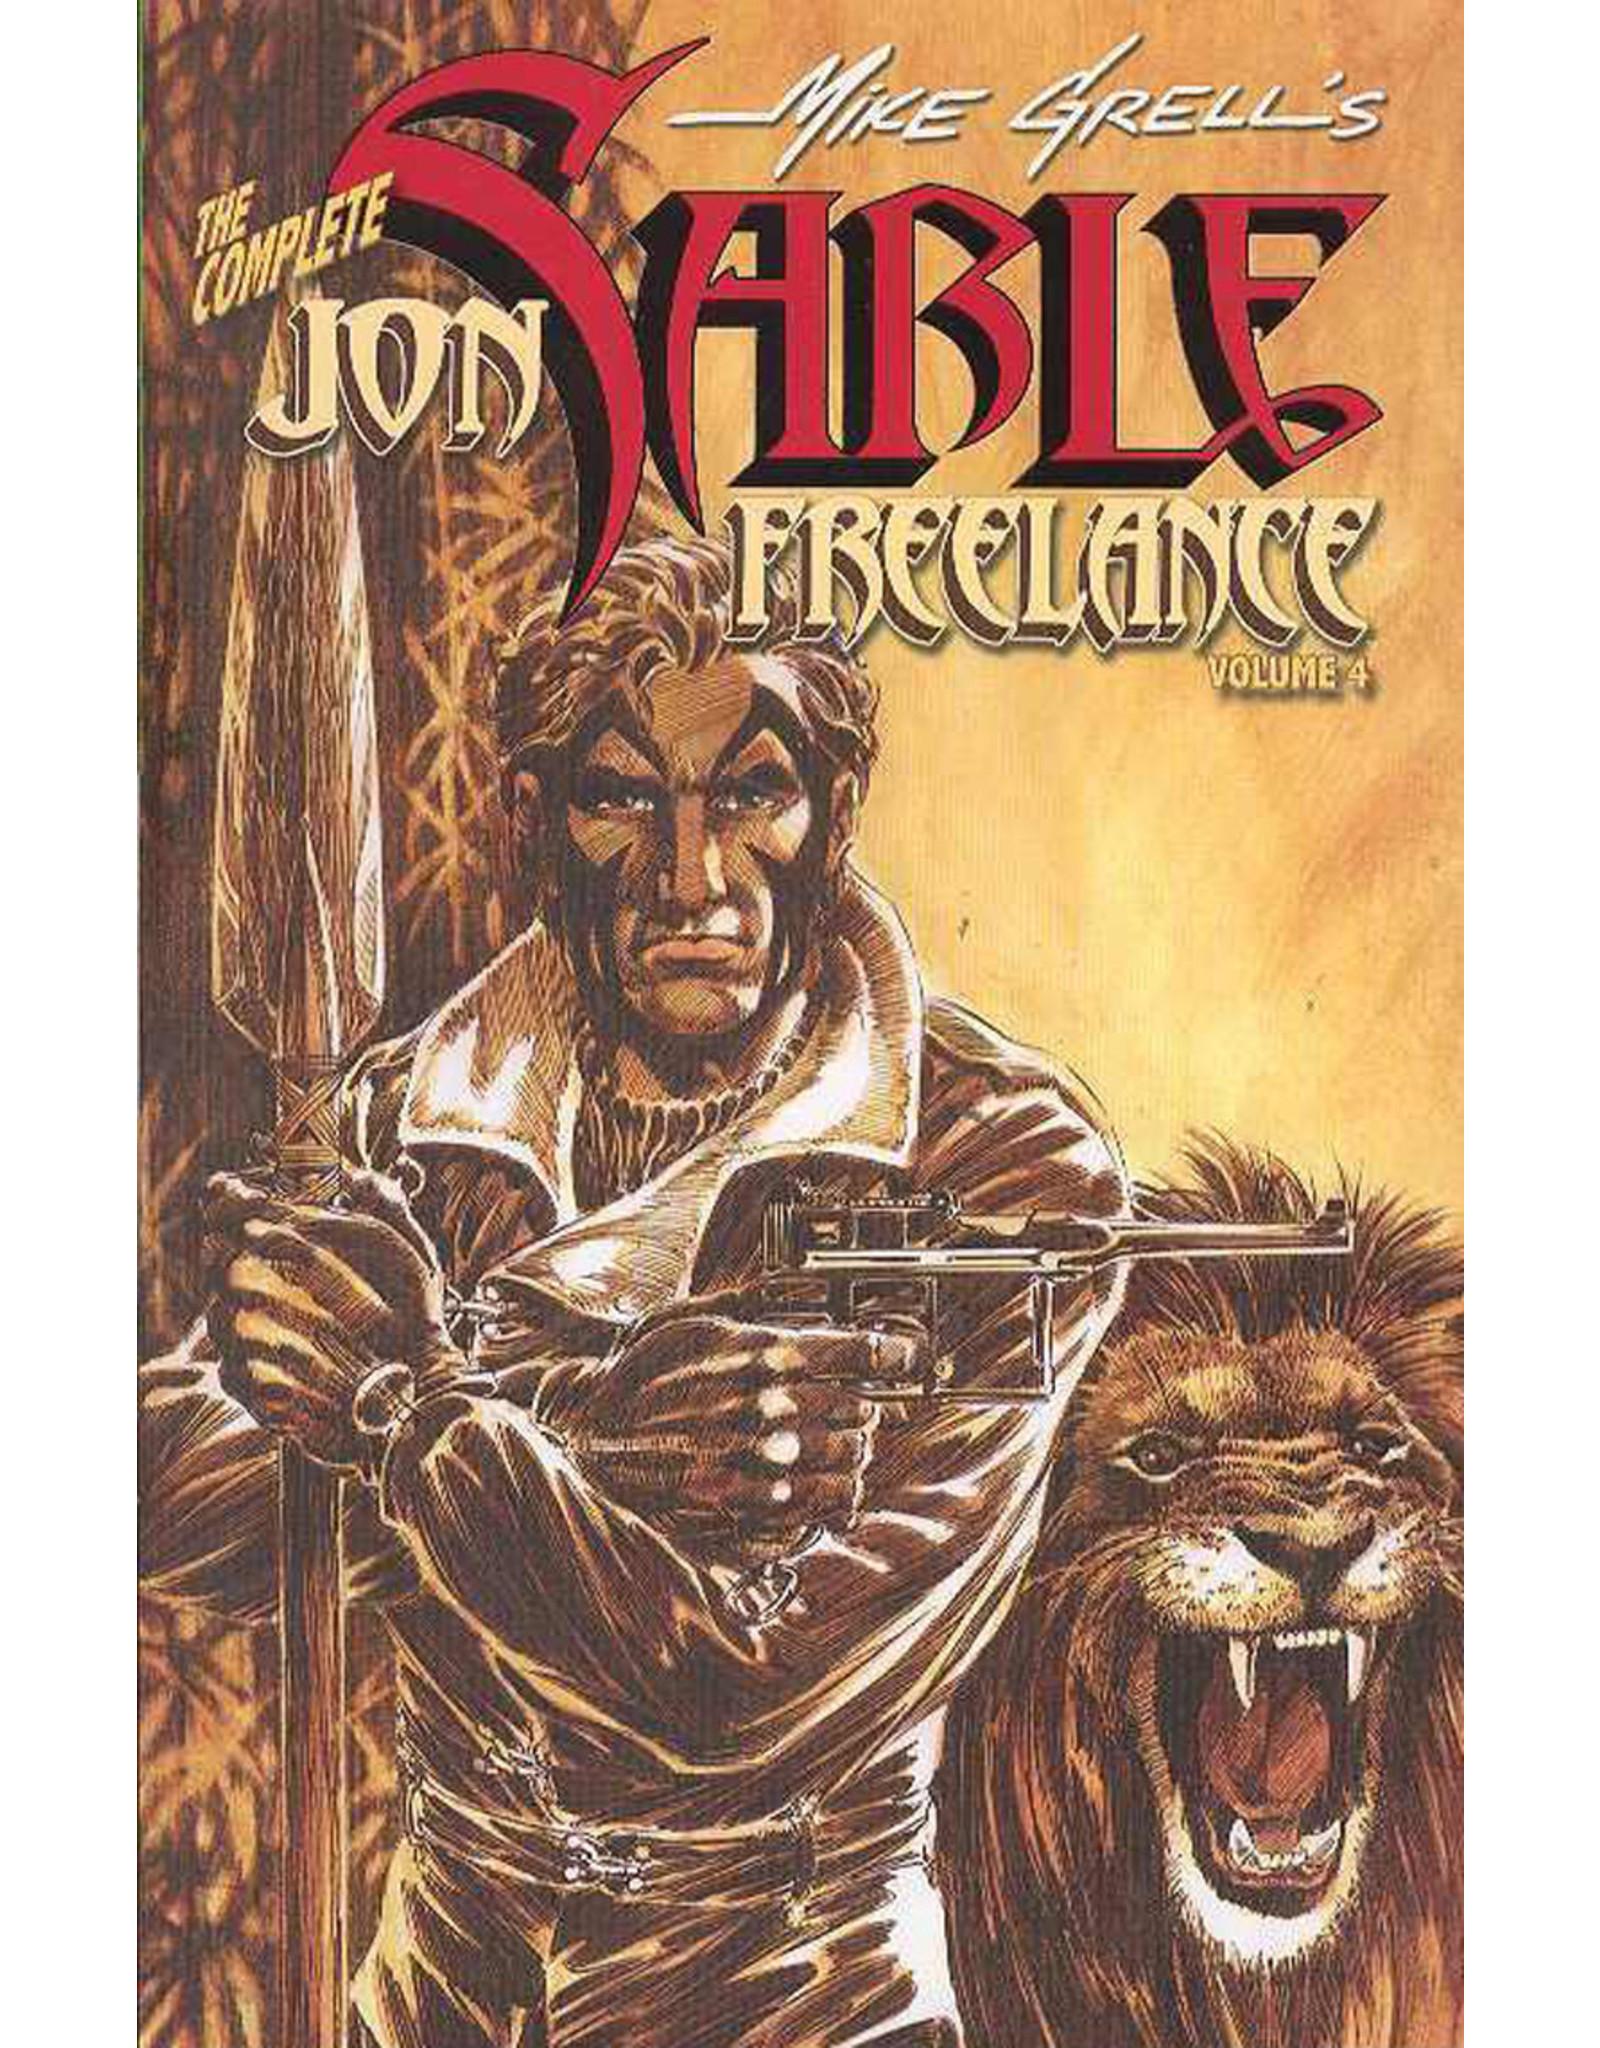 IDW PUBLISHING COMPLETE JON SABLE FREELANCE TP VOL 04